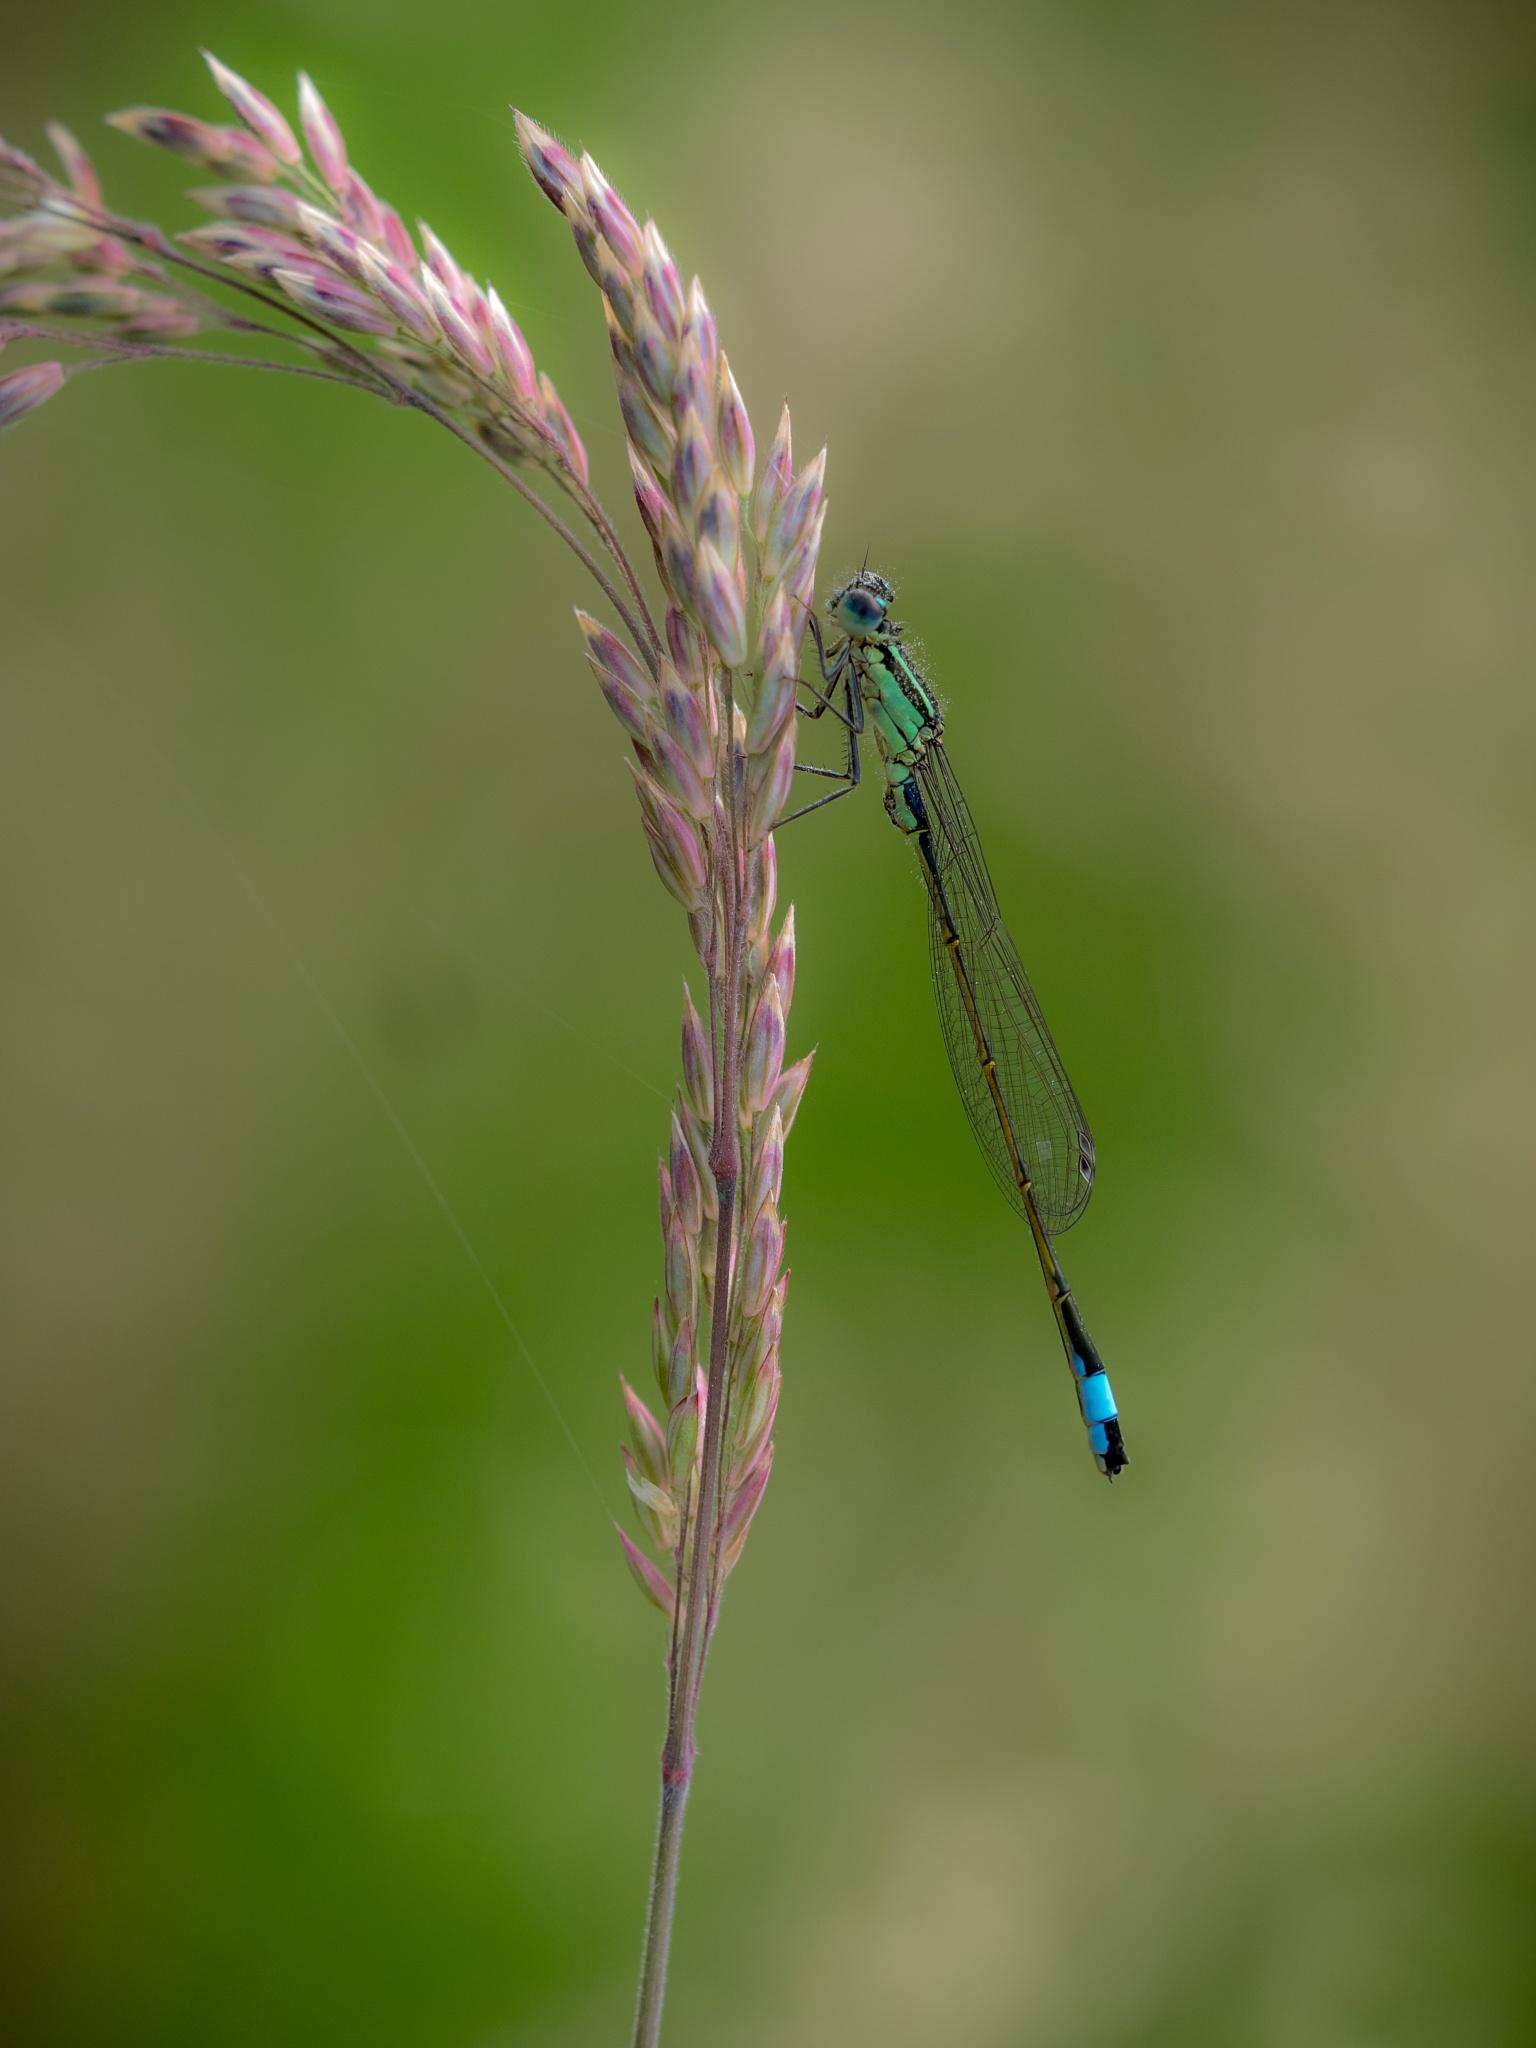 Blue-tailed damselfly by Sarah Walters